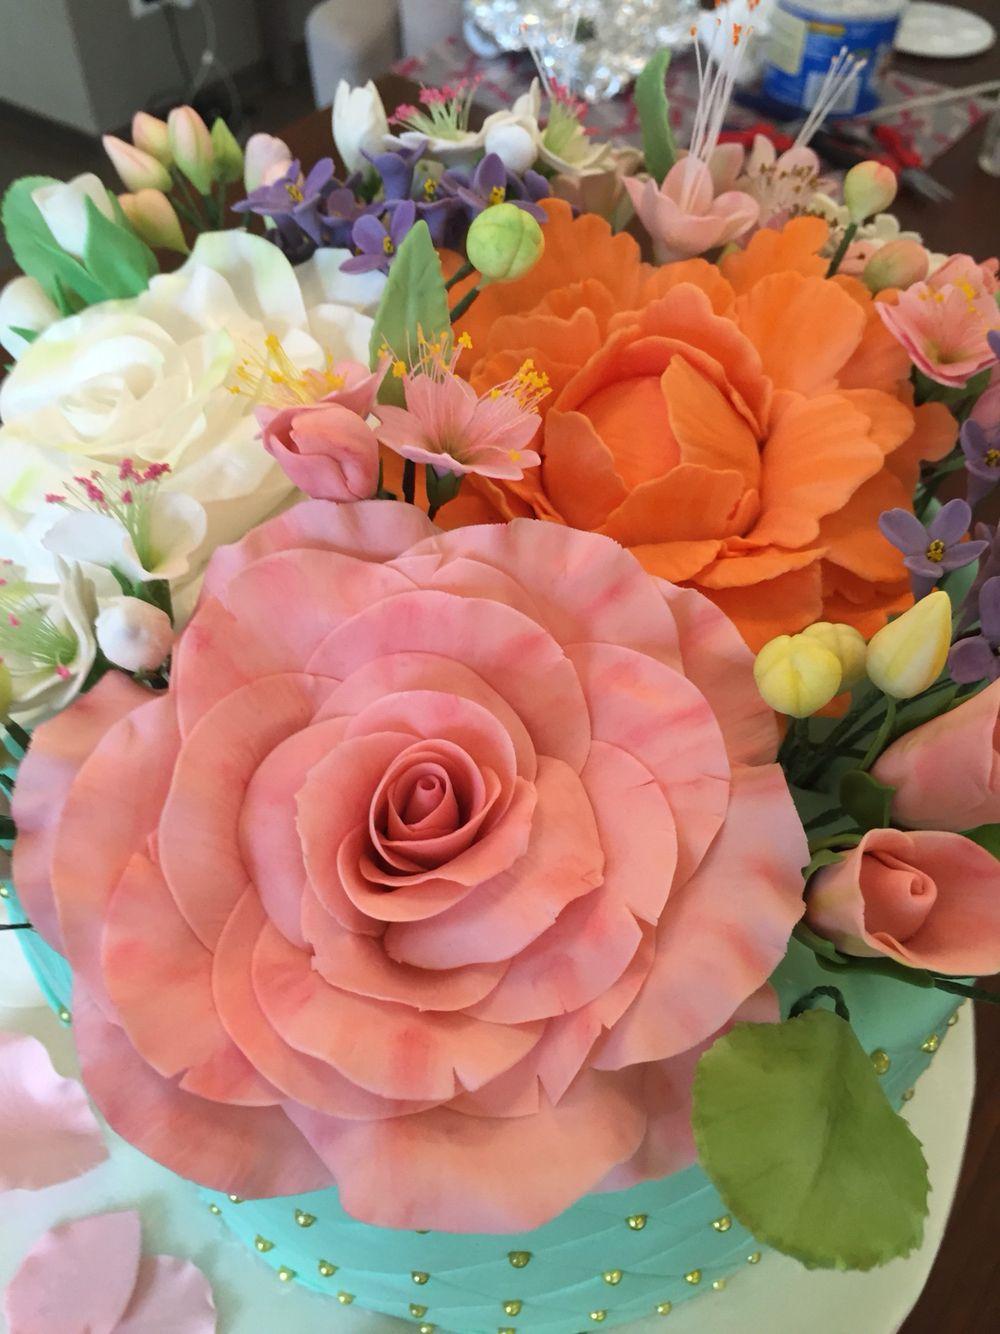 Mint green flower bouquet cake - pink rose | My cakes | Pinterest ...